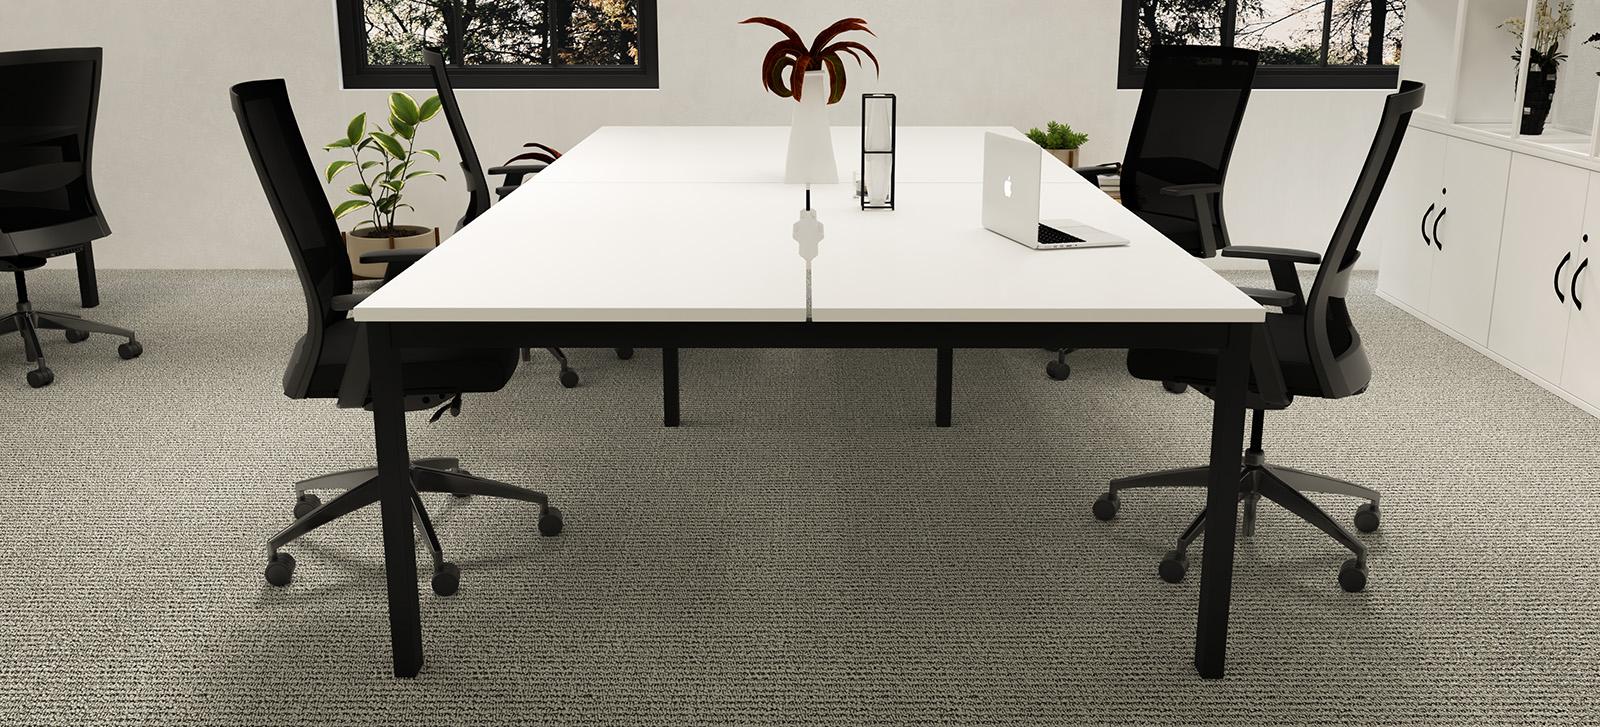 Affordable bench desk Mercol Horizon